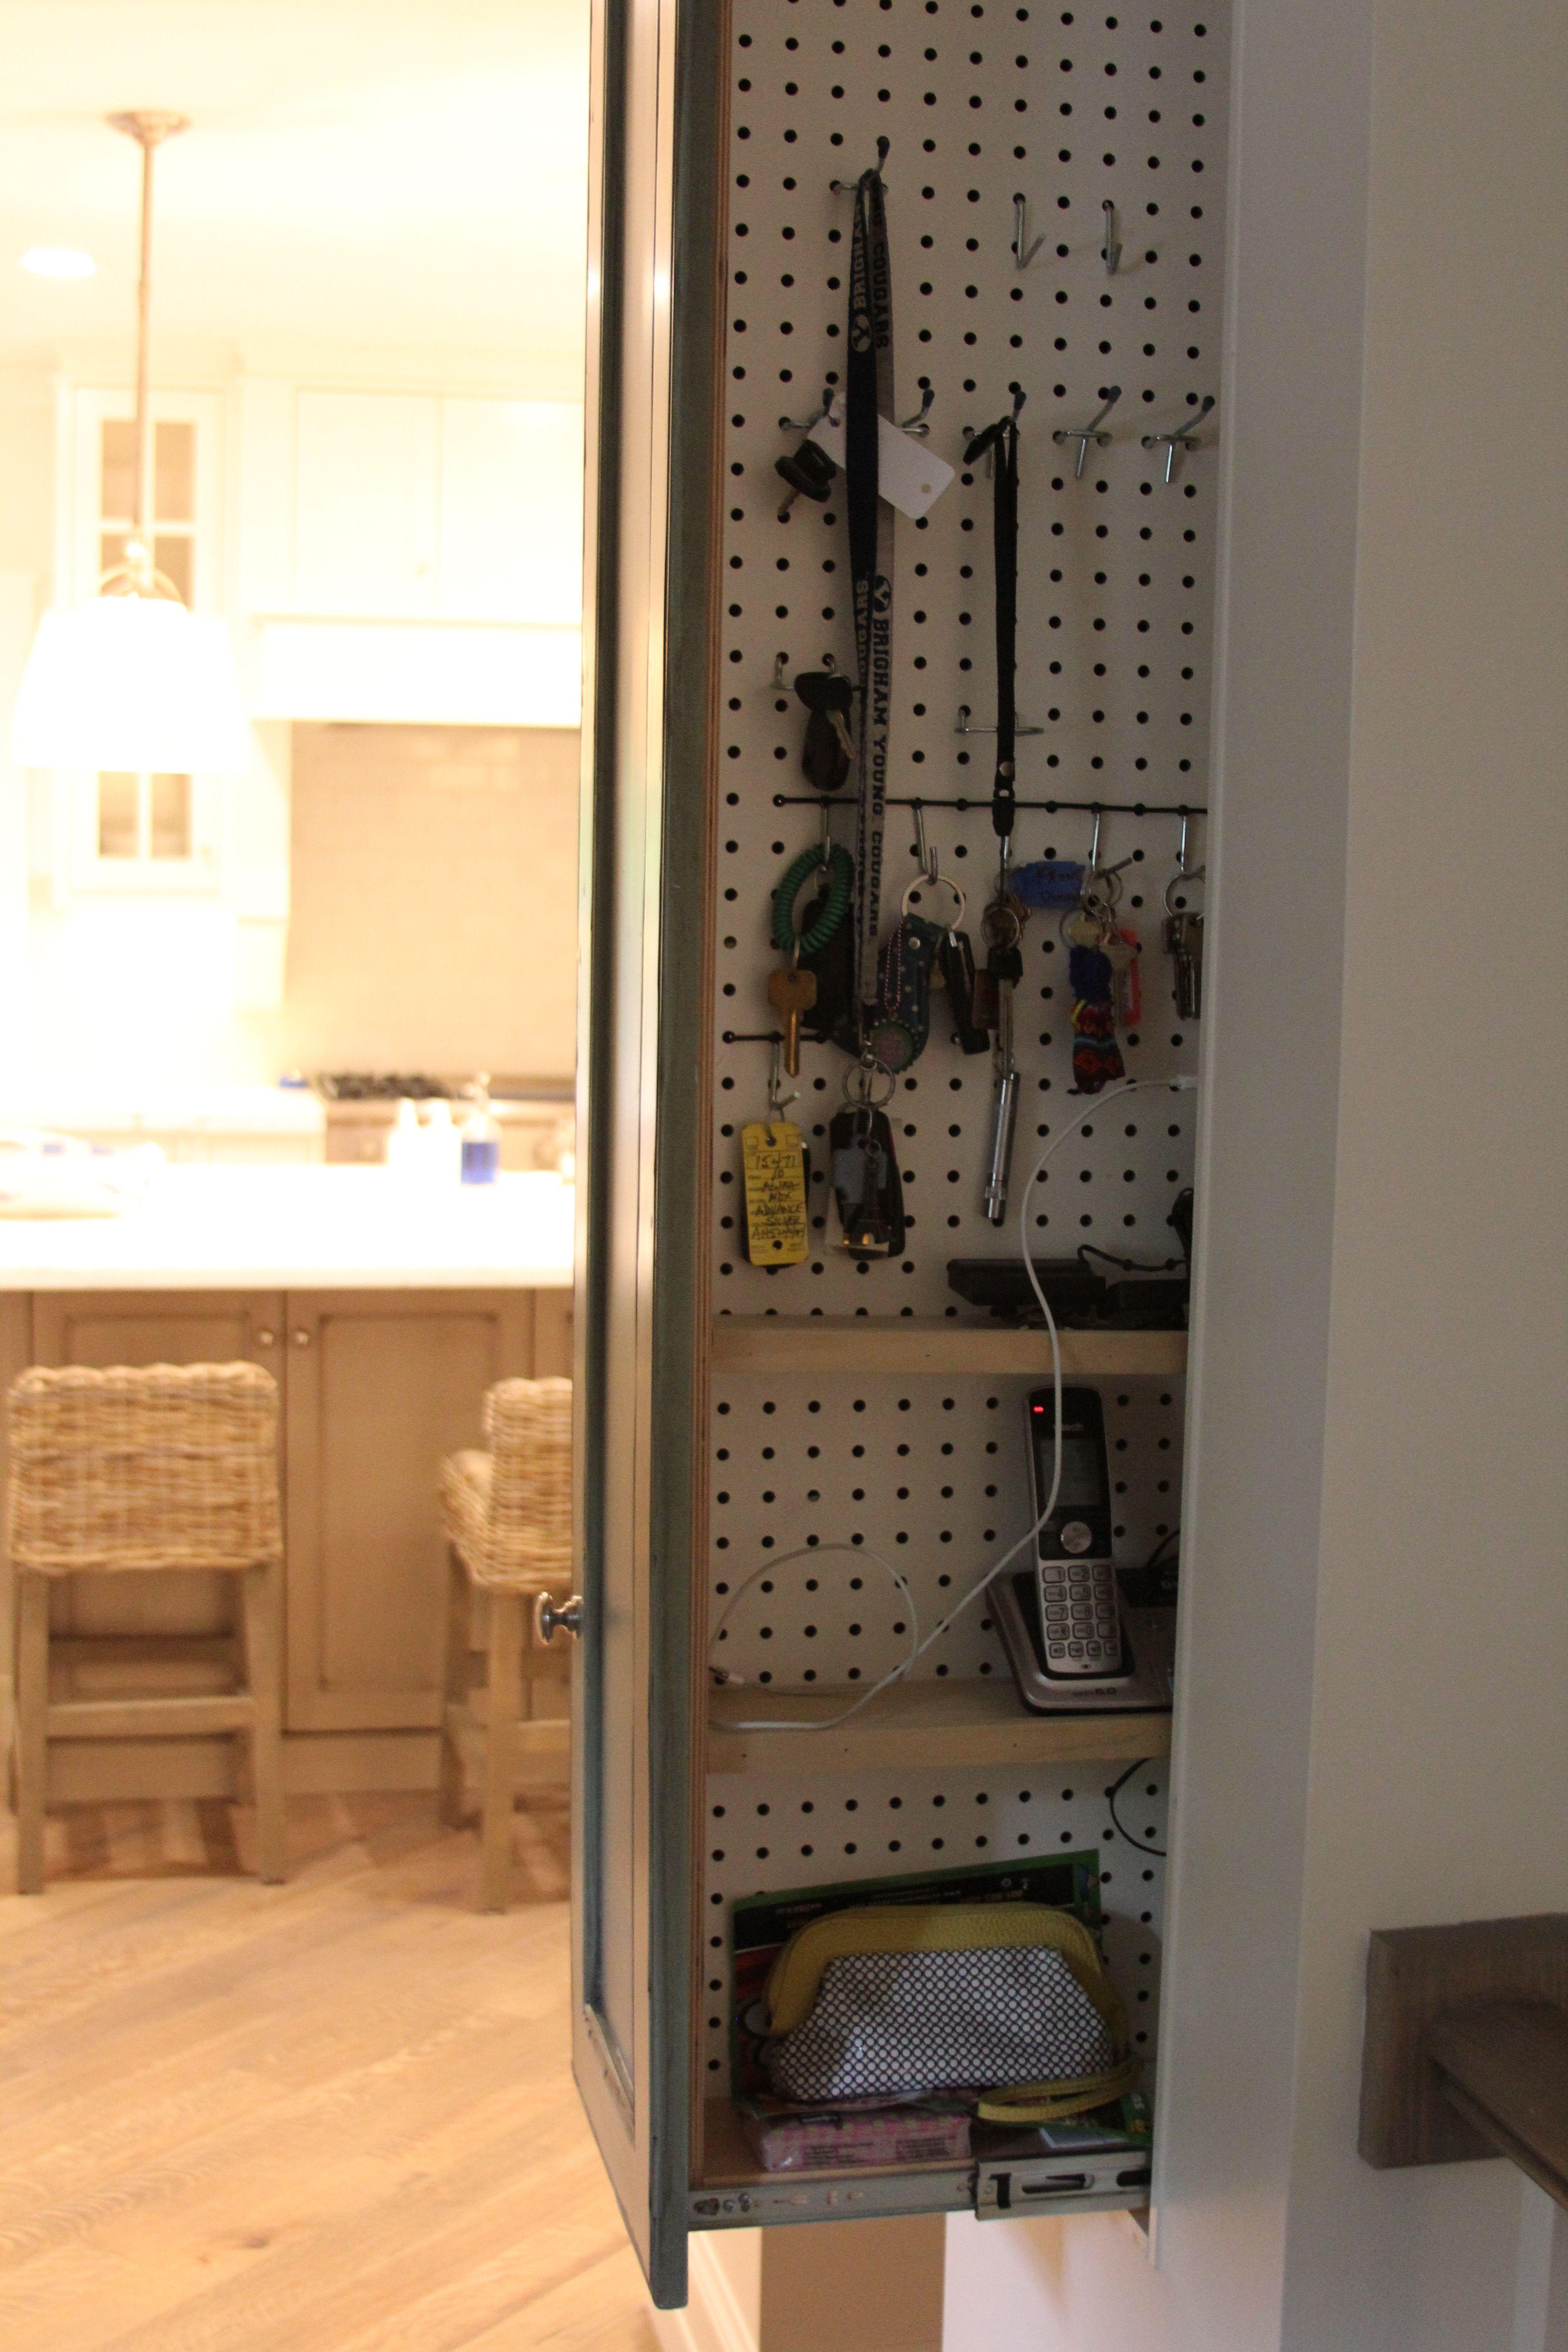 Neat Hidden Compartment For Keys Charging Phones Etc Home Drawer Kitchen Kitchenideas Slidingdrawer Homeideas Smarthome